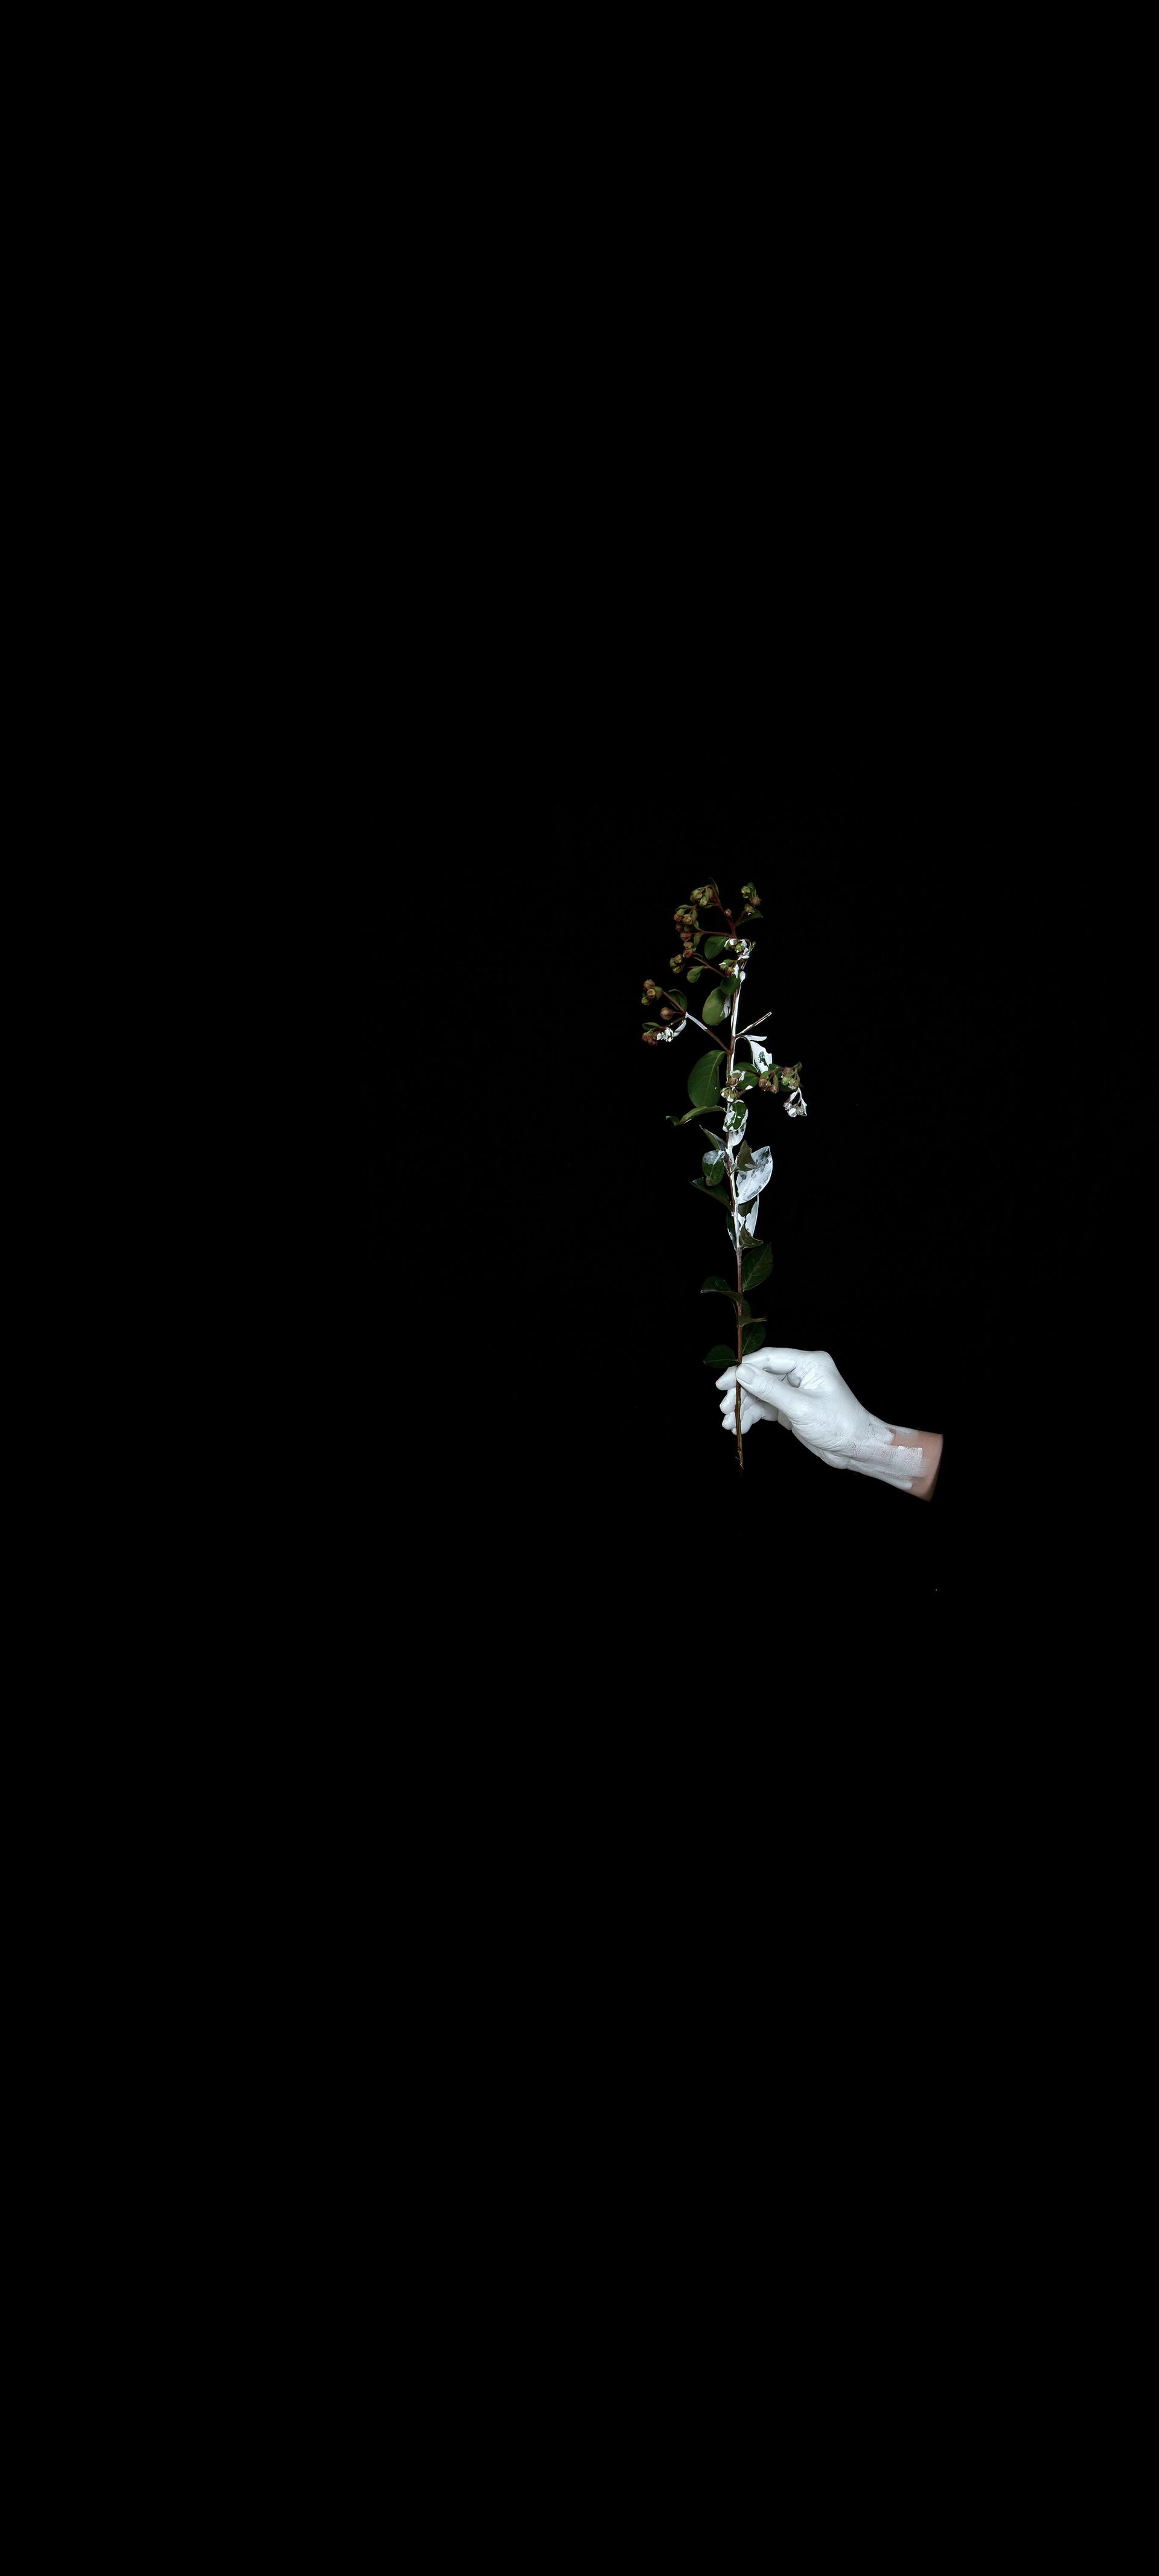 """Another White #3"" / 2020 / 180x400cm / print on film, light"